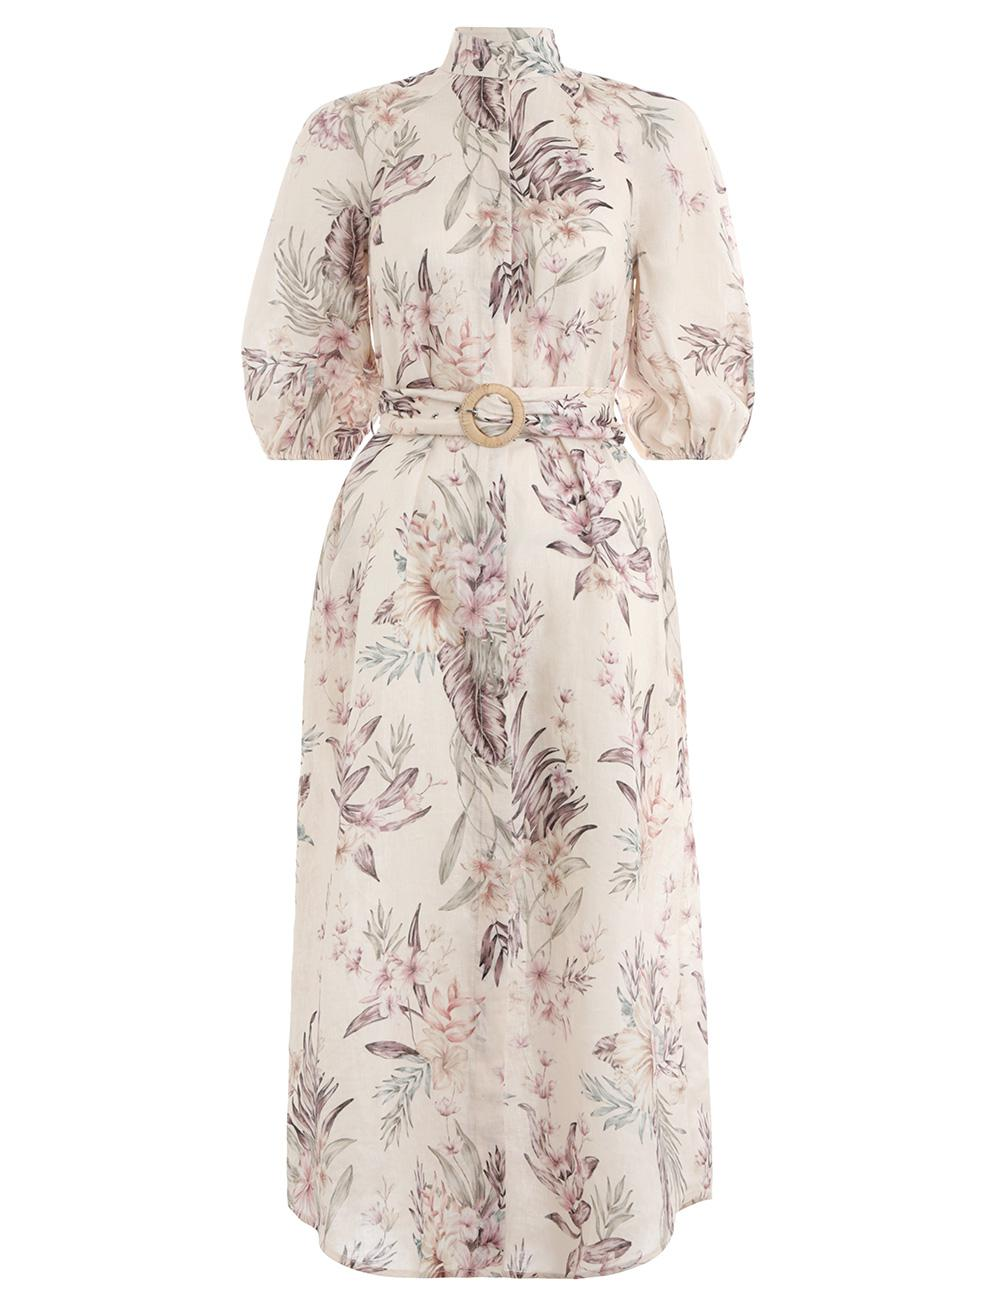 b4cb6ec3c3 Lyst - Zimmermann Tropical Print Dress - Save 12%